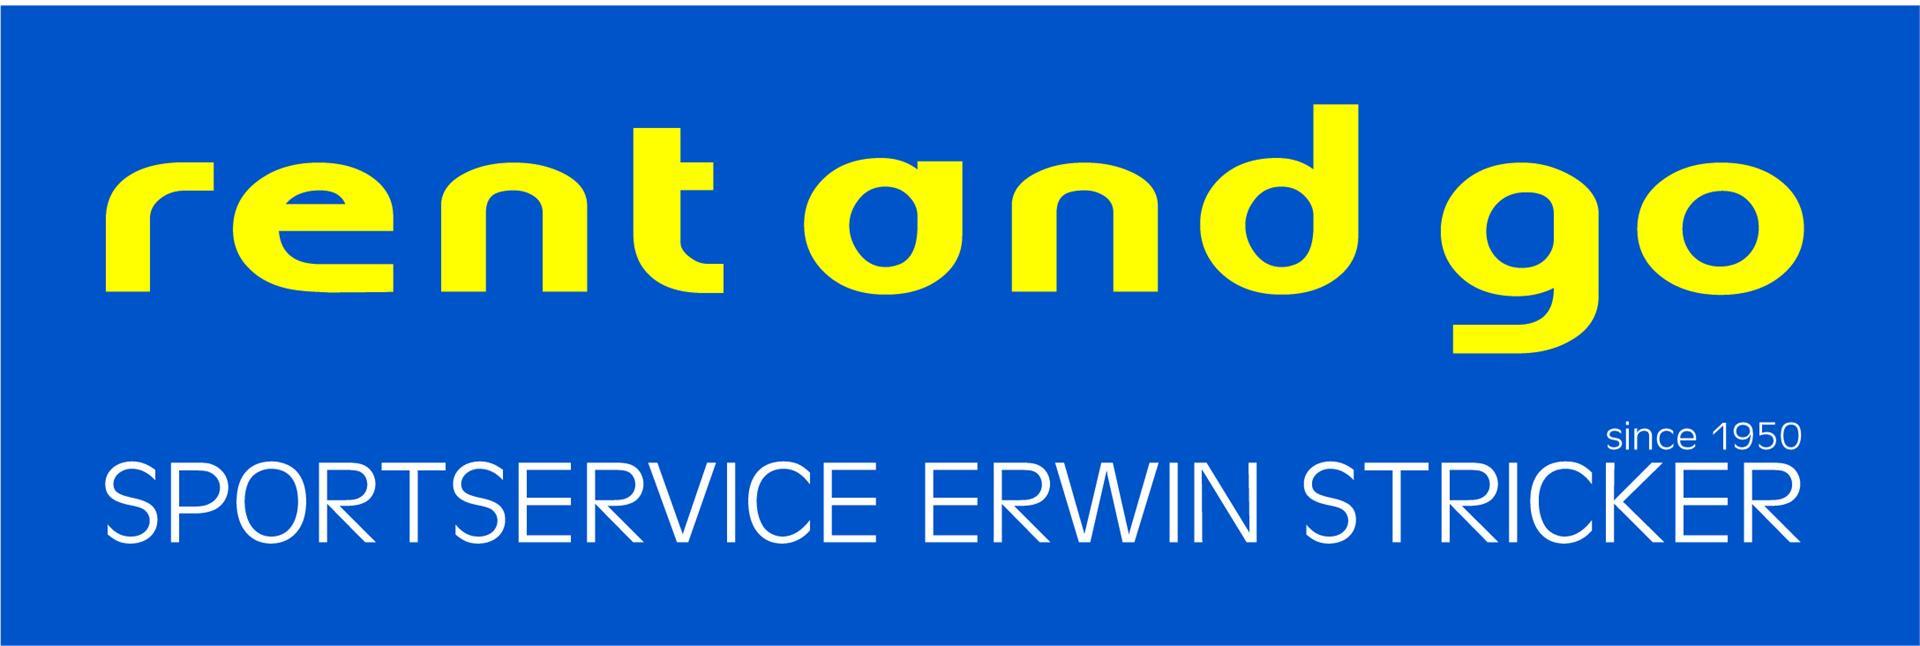 Sportservice Erwin Stricker